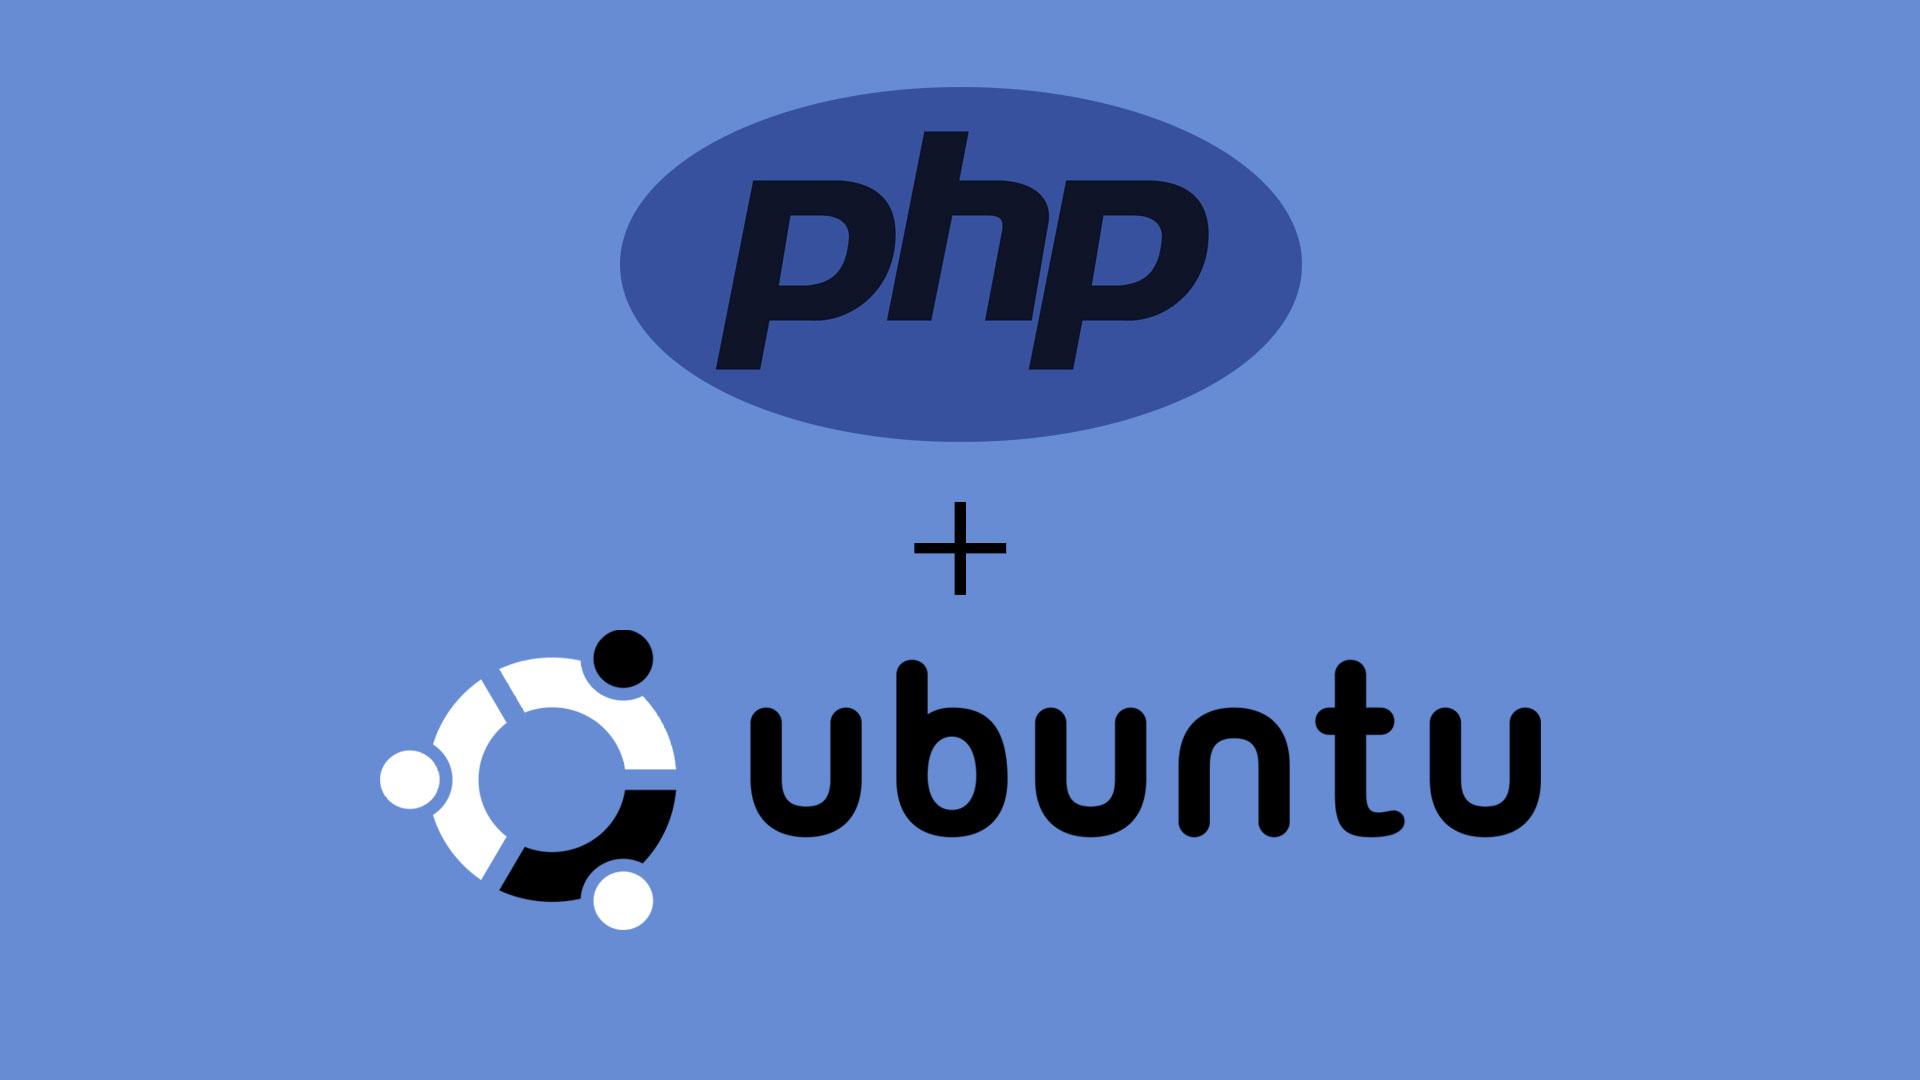 How to Install PHP 7.2 on Ubuntu 16.04 / 18.04 / 18.10